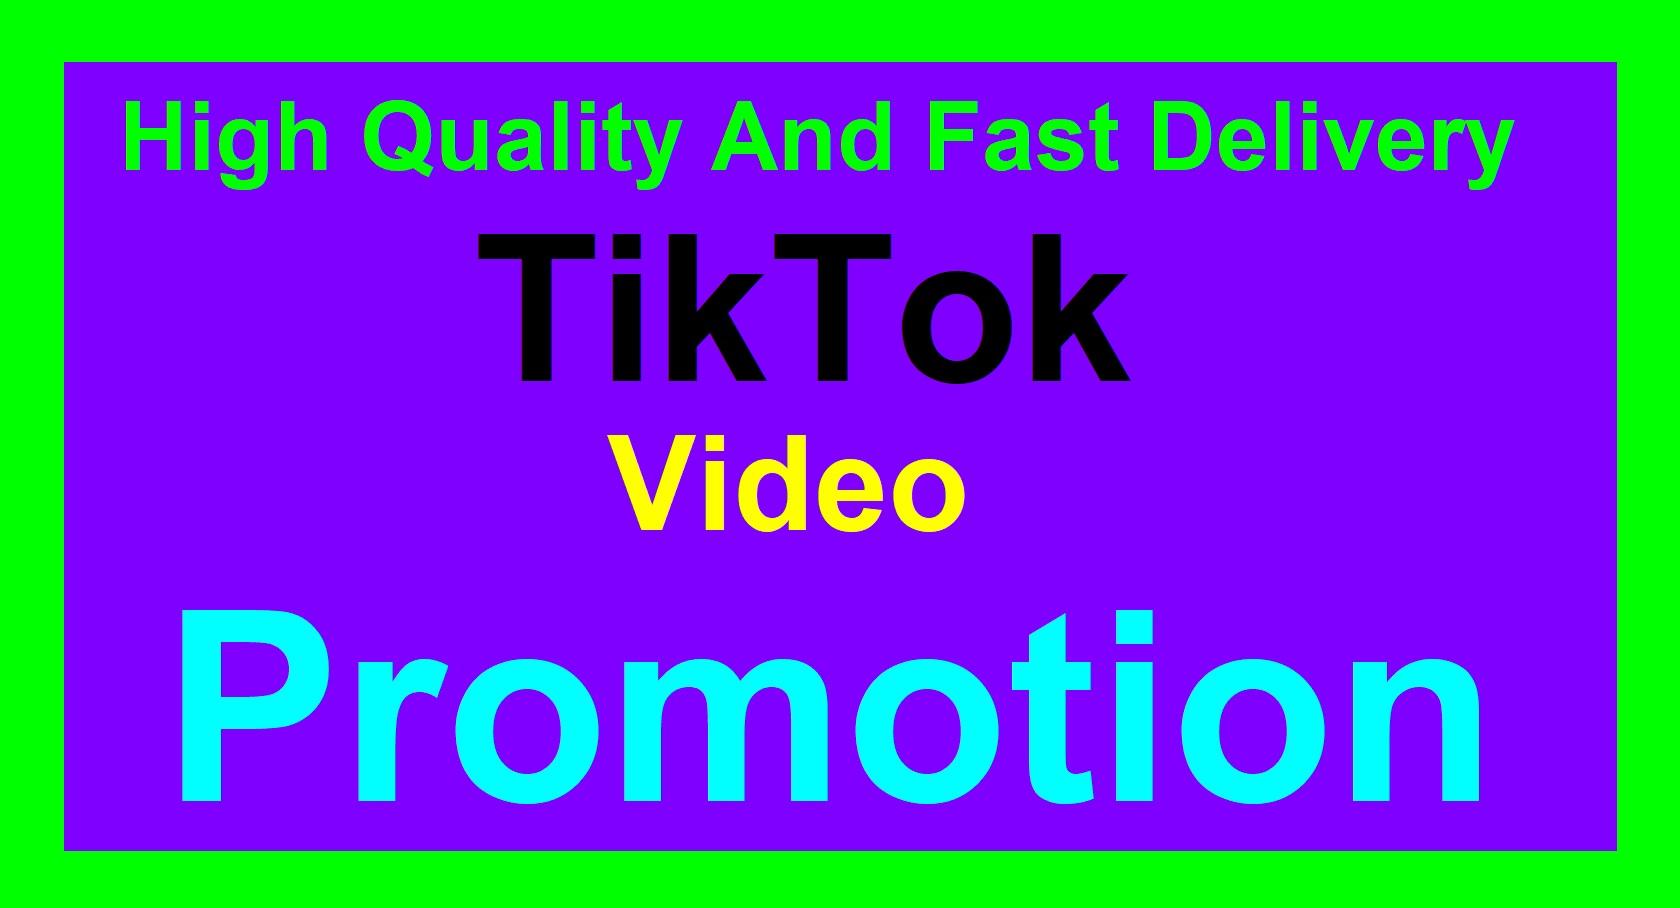 Very Retention Tiktok Video Promotion and Social Media Marketing